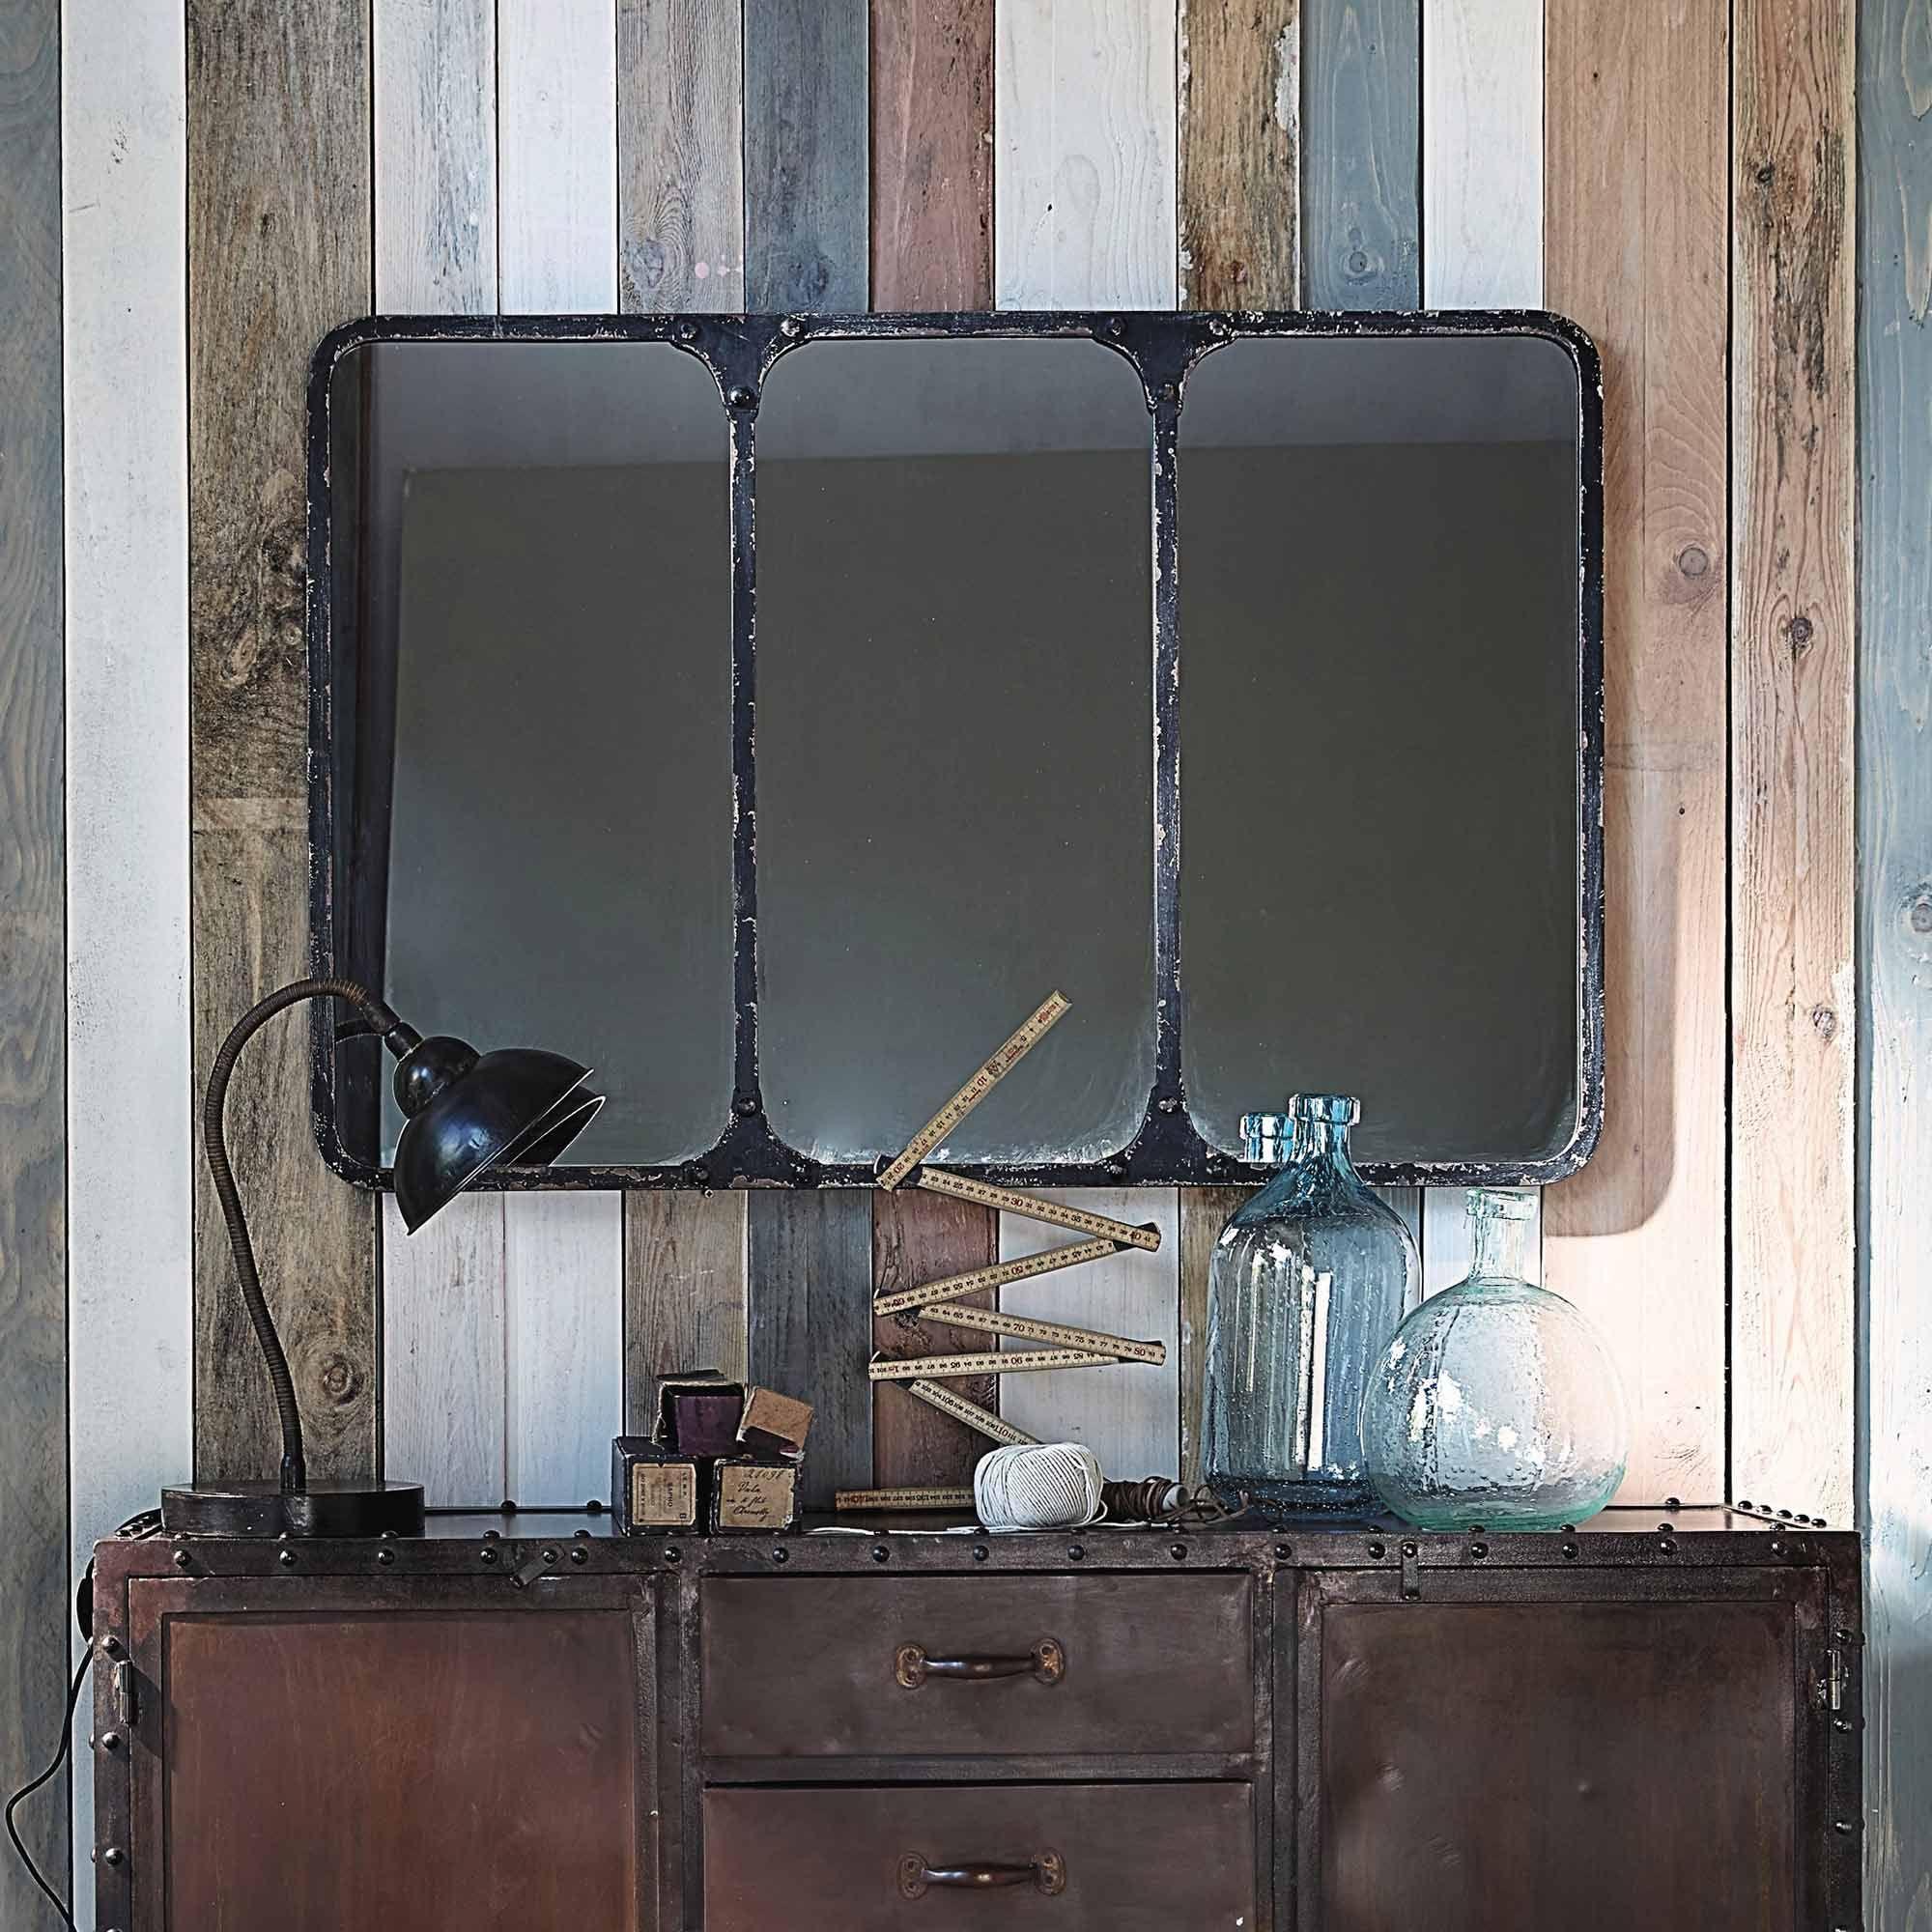 Miroir Maison Du Monde Industriel miroir indus en métal noir 106x72 | miroir industriel